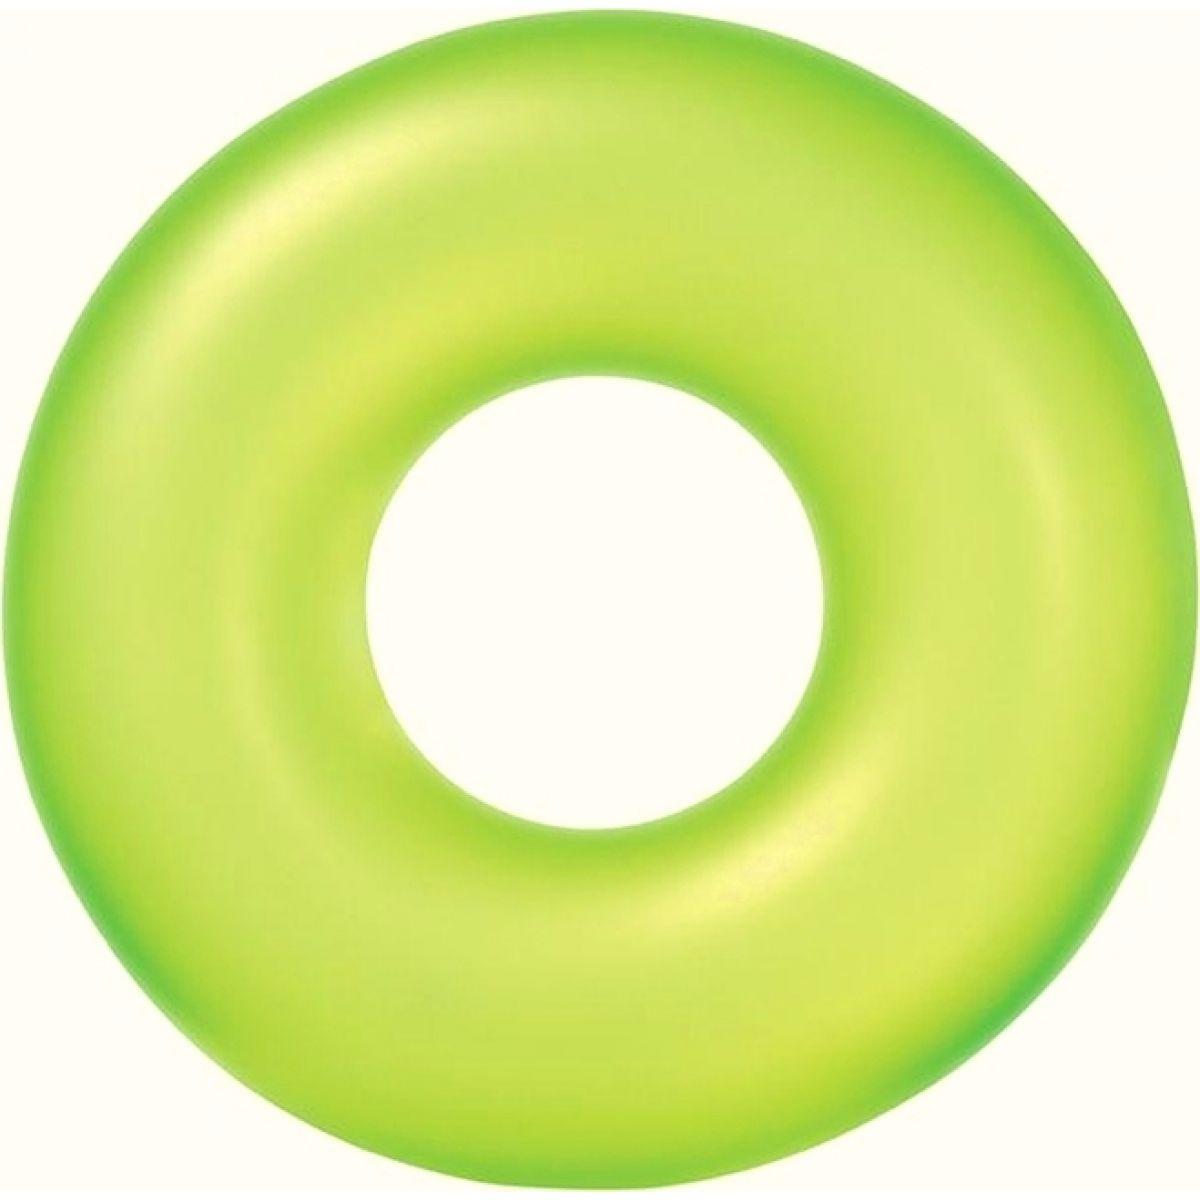 Plavací kruh 91cm Neon Frost Intex 59262 - Zelená